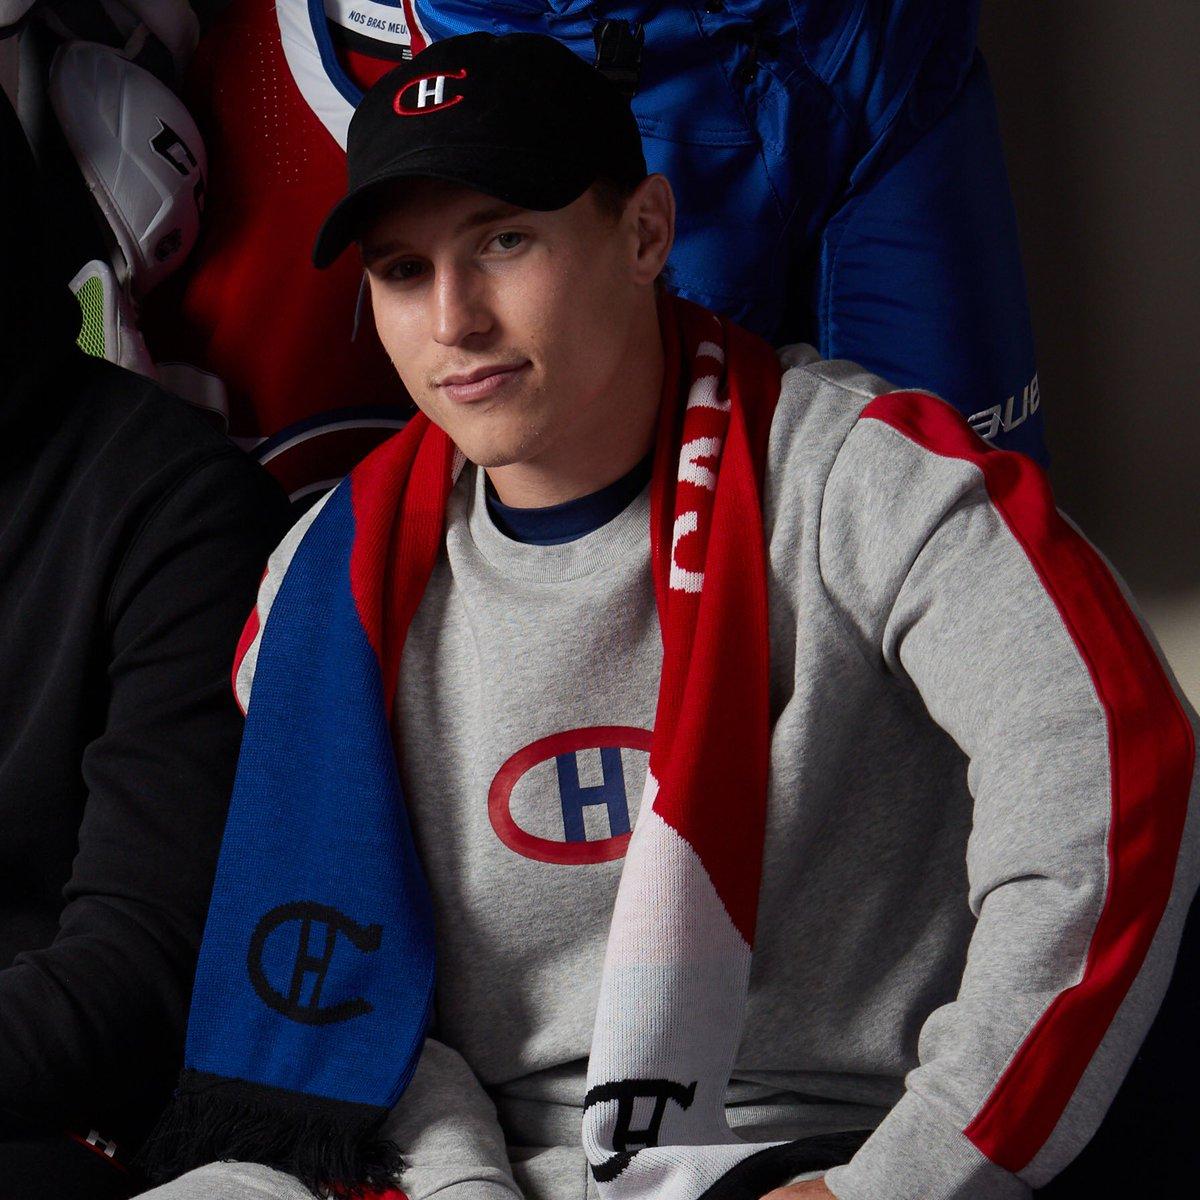 da067399a1f Canadiens Montréal on Twitter: